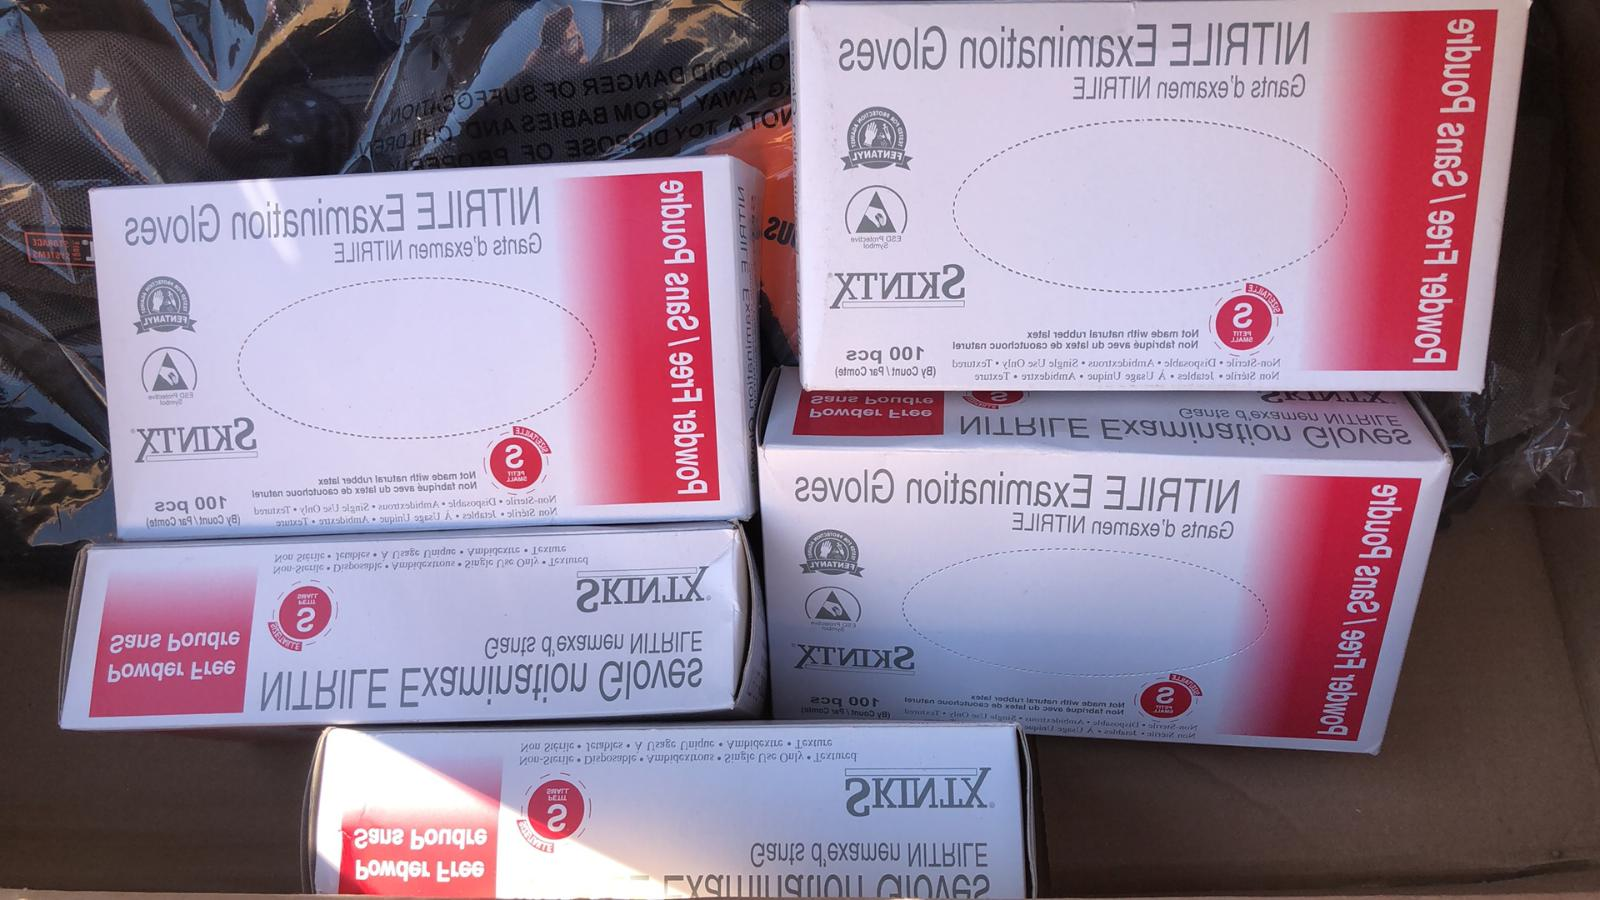 nitrile examination gloves size s 500 gloves